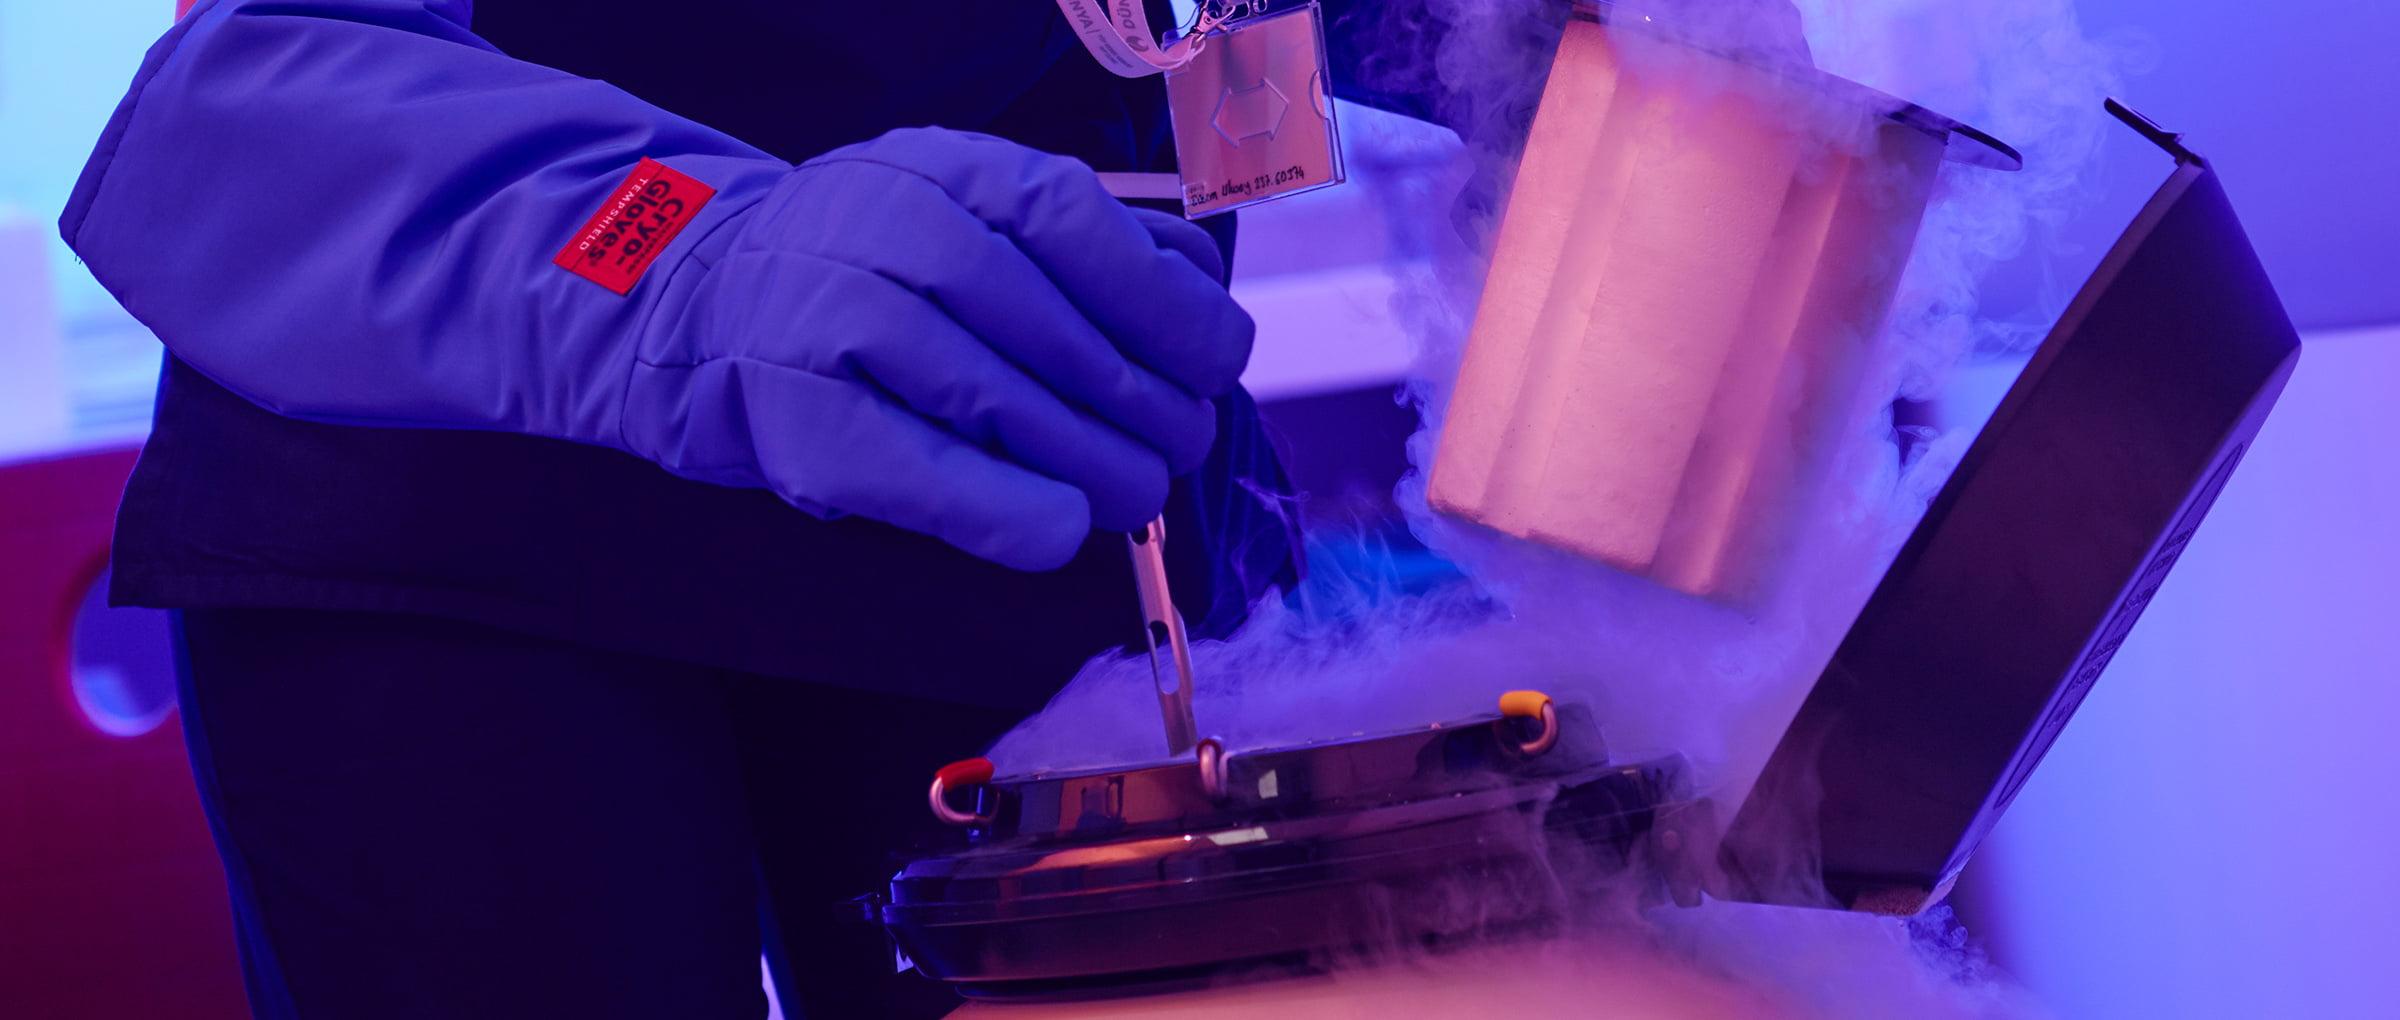 Dunya IVF cryopreservation